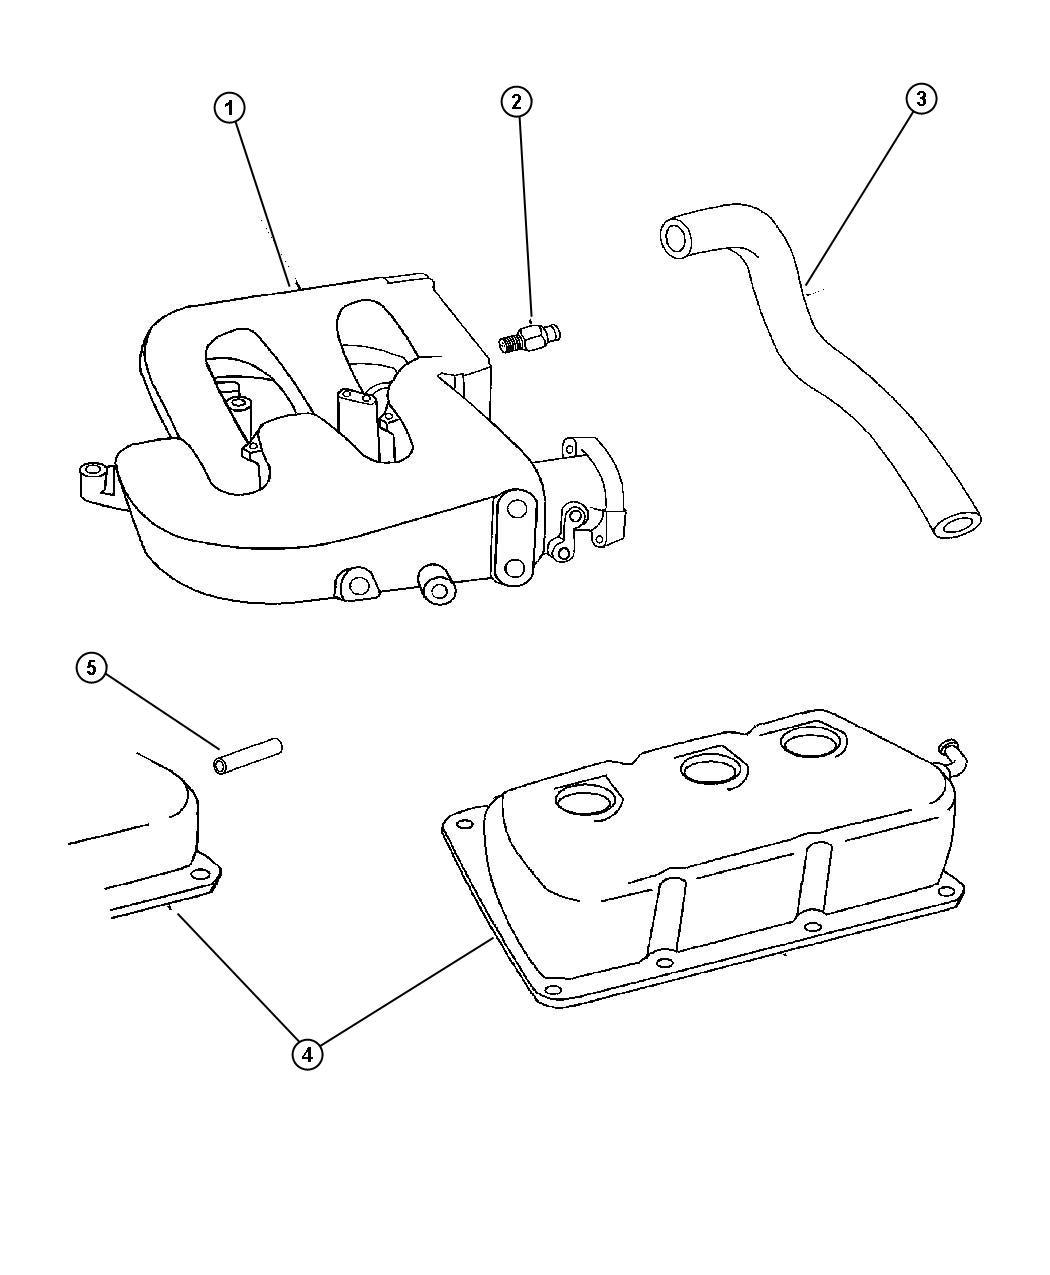 Dodge Intrepid Tube. Pcv valve. Pcv cylinder head cover to